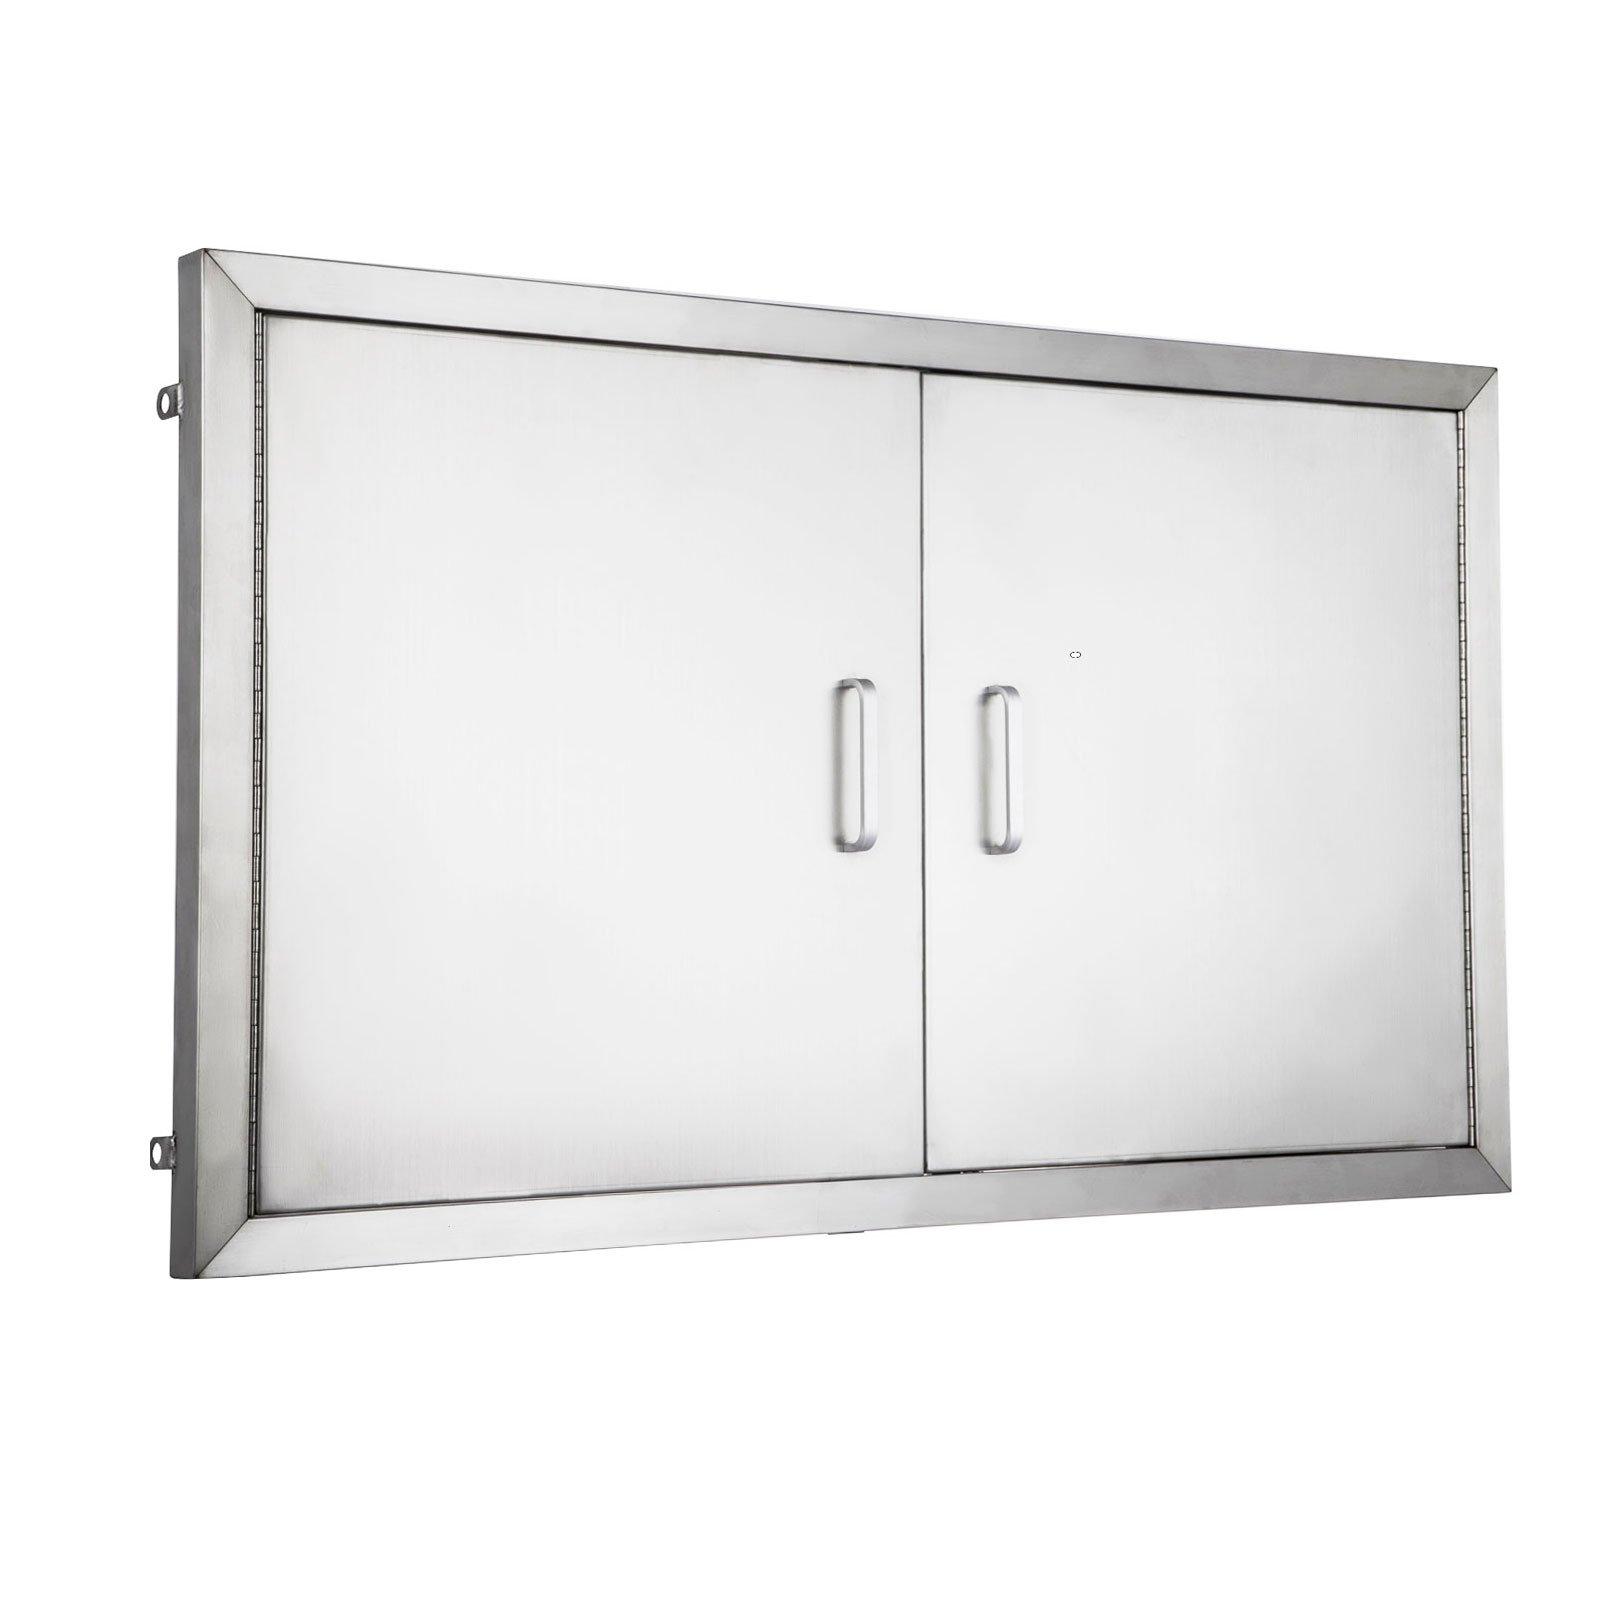 Get Quotations · Happybuy BBQ Island Door 36 Inch Flush Mount BBQ Access  Door Commercial 304 Brushed Stainless Steel